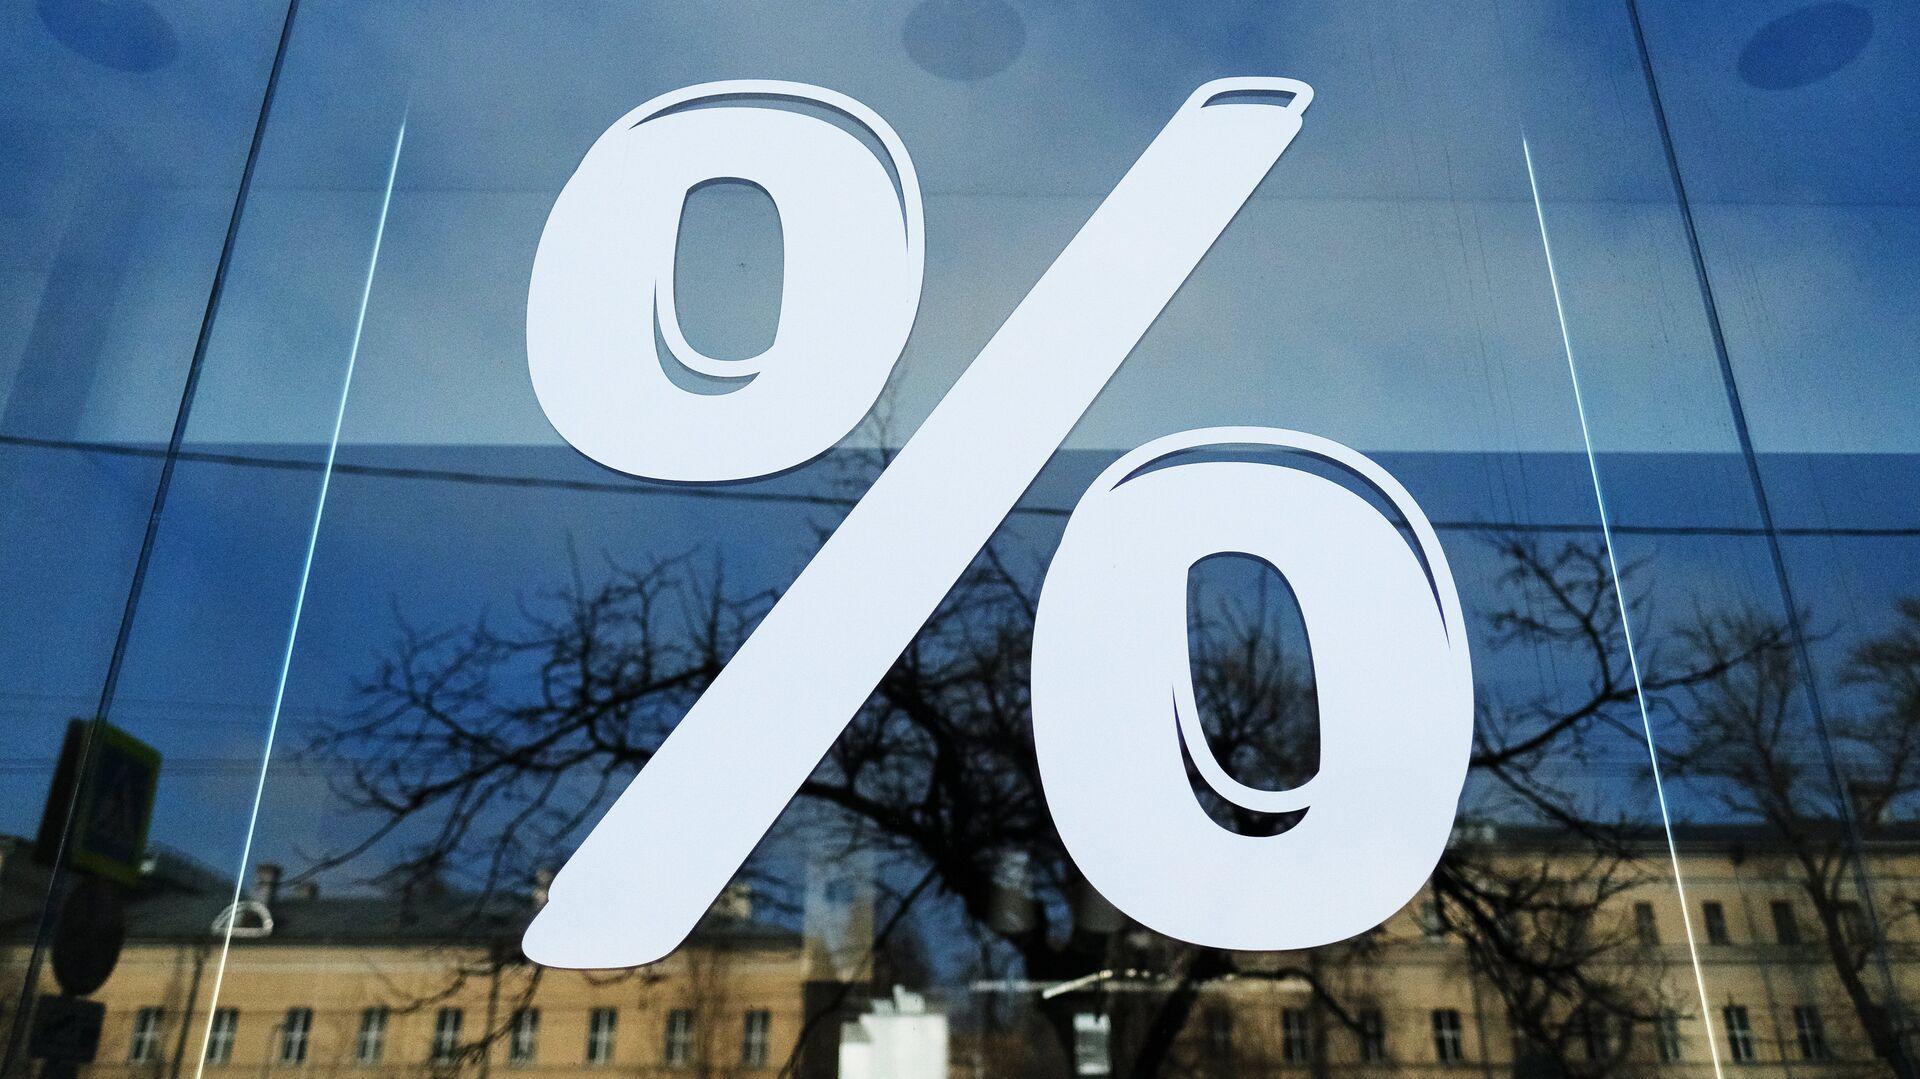 Аналитик спрогнозировал начало роста ставок по вкладам